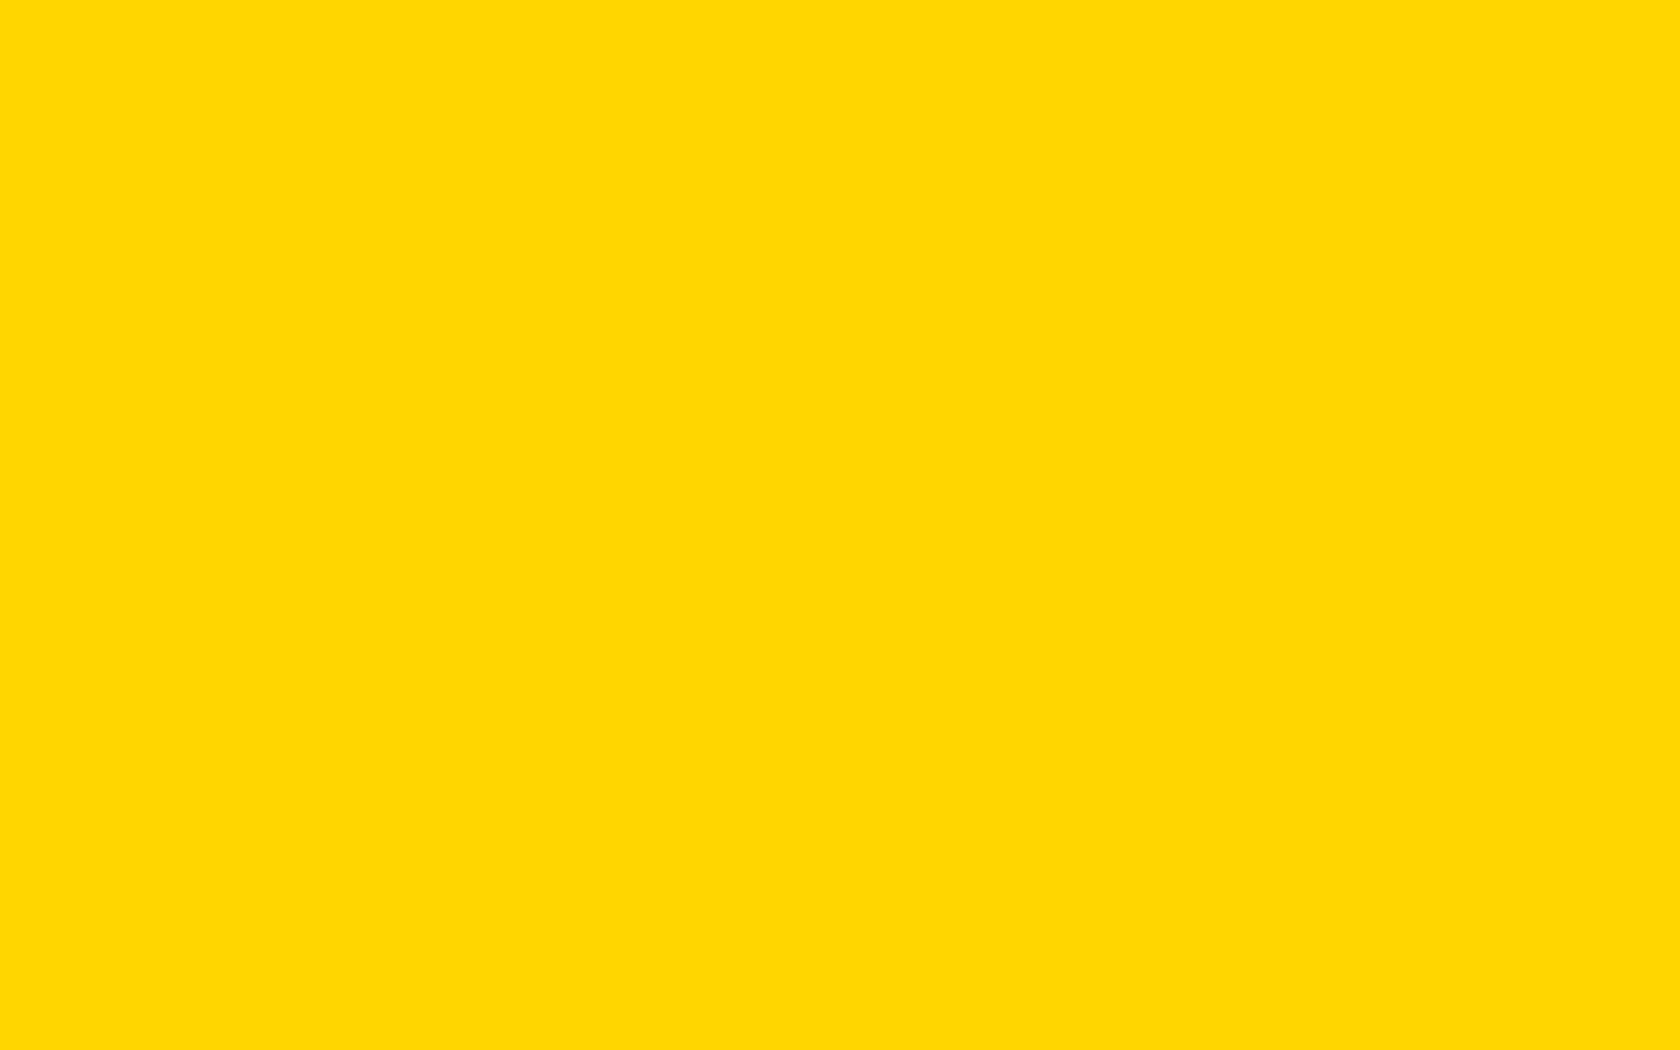 1680x1050 Gold Web Golden Solid Color Background